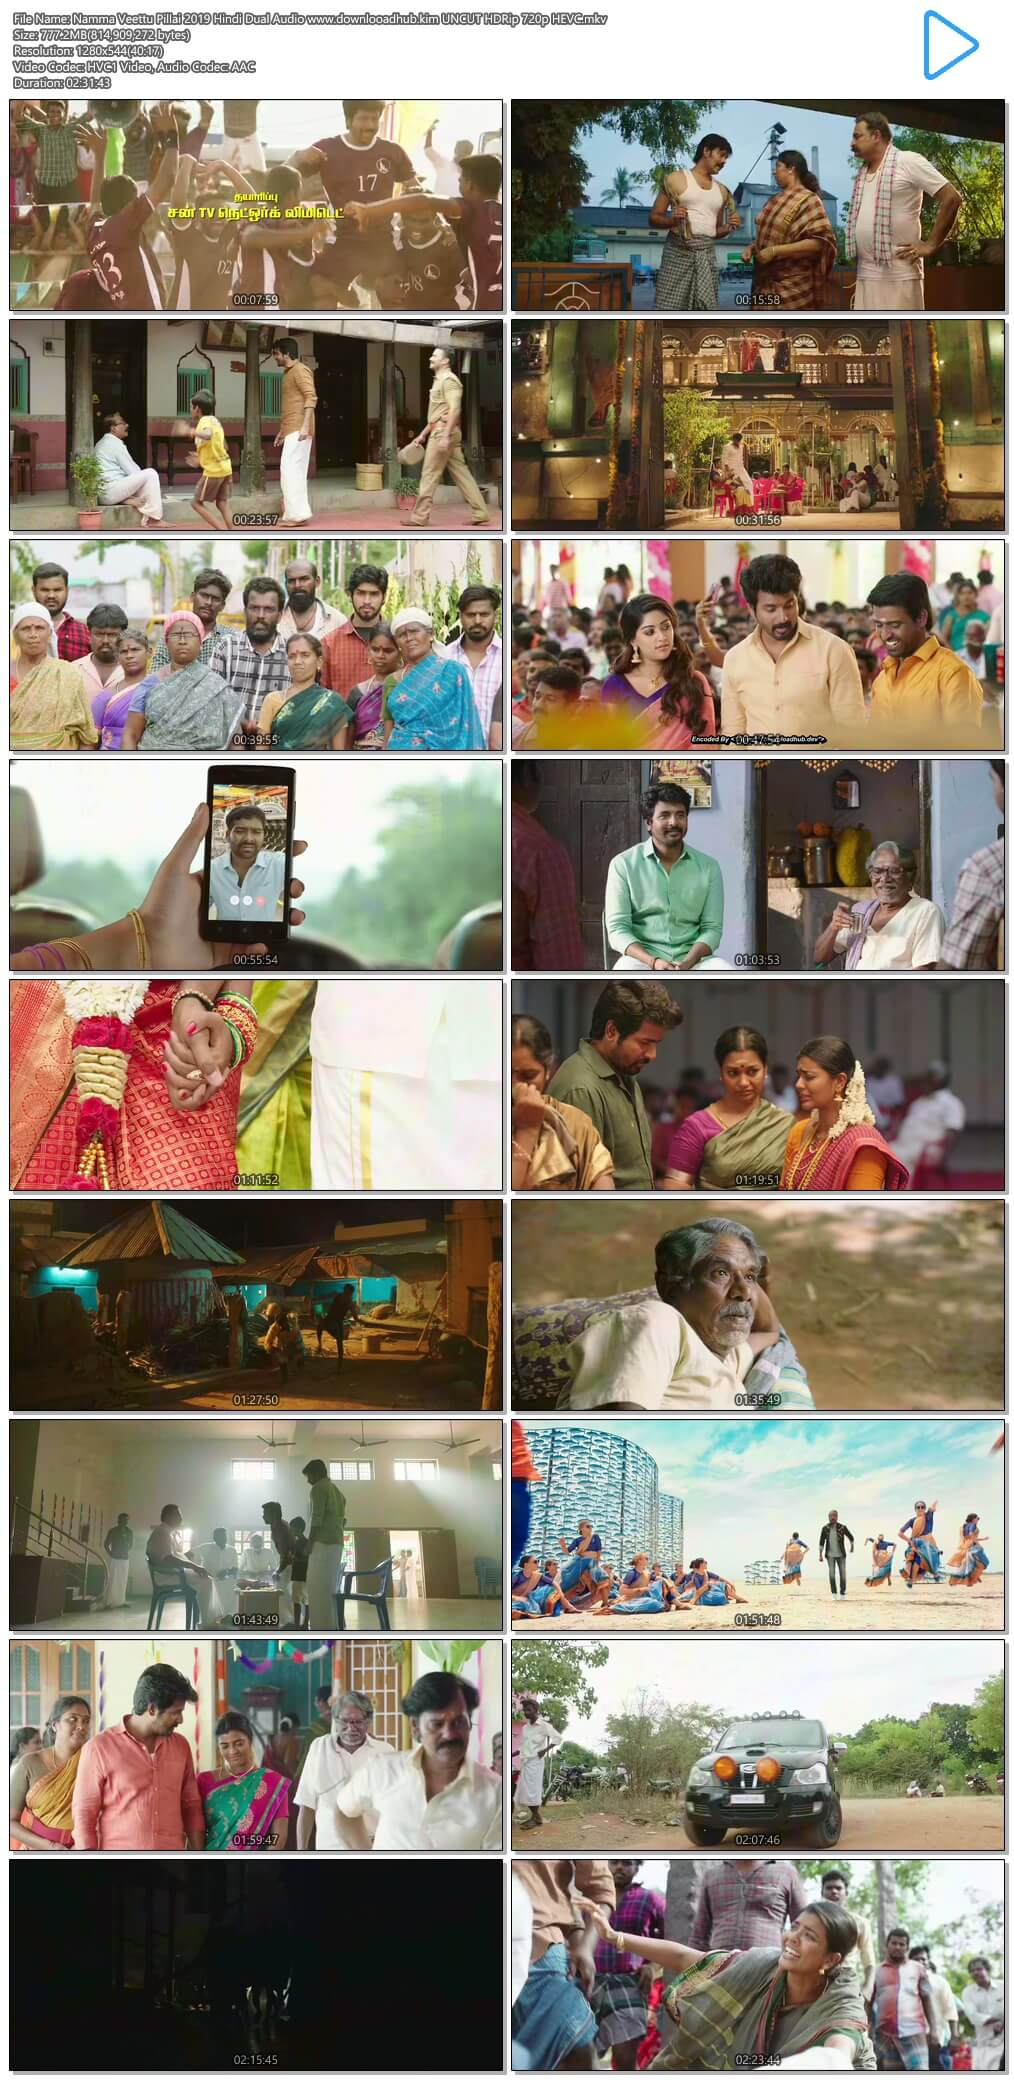 Namma Veettu Pillai 2019 Hindi Dual Audio 750MB UNCUT HDRip 720p HEVC